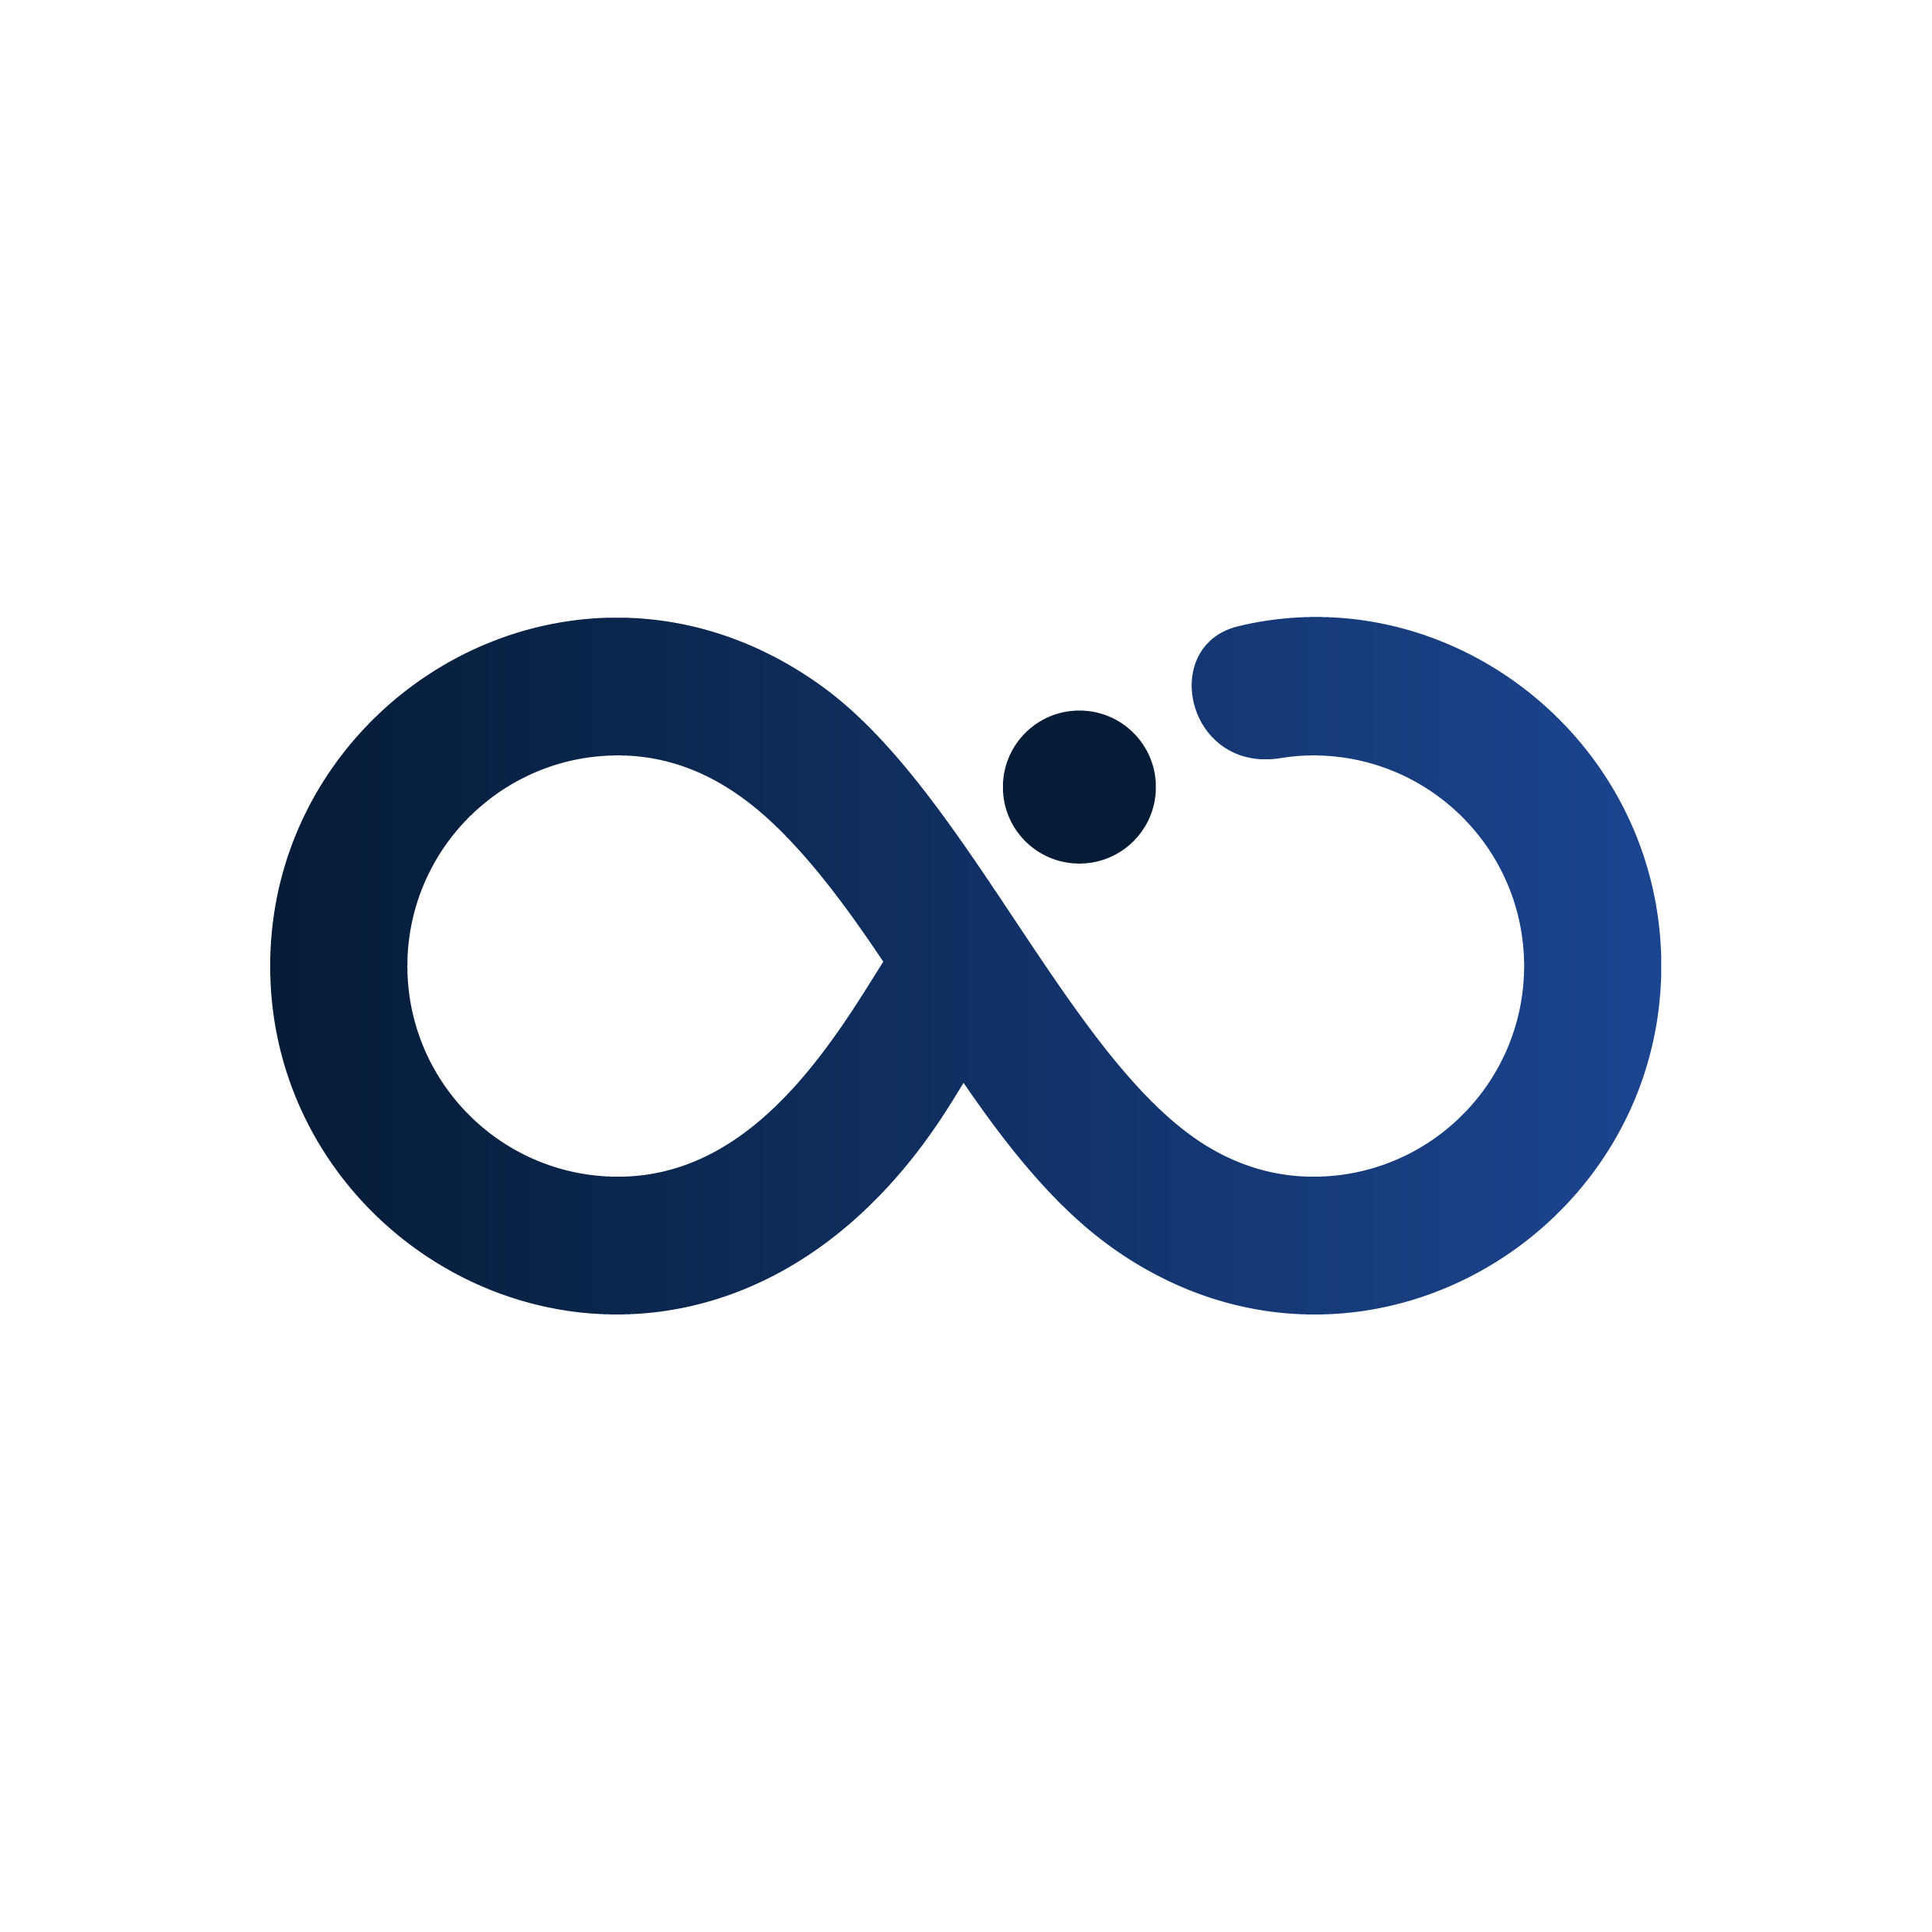 Ocean Infinity - Wikipedia